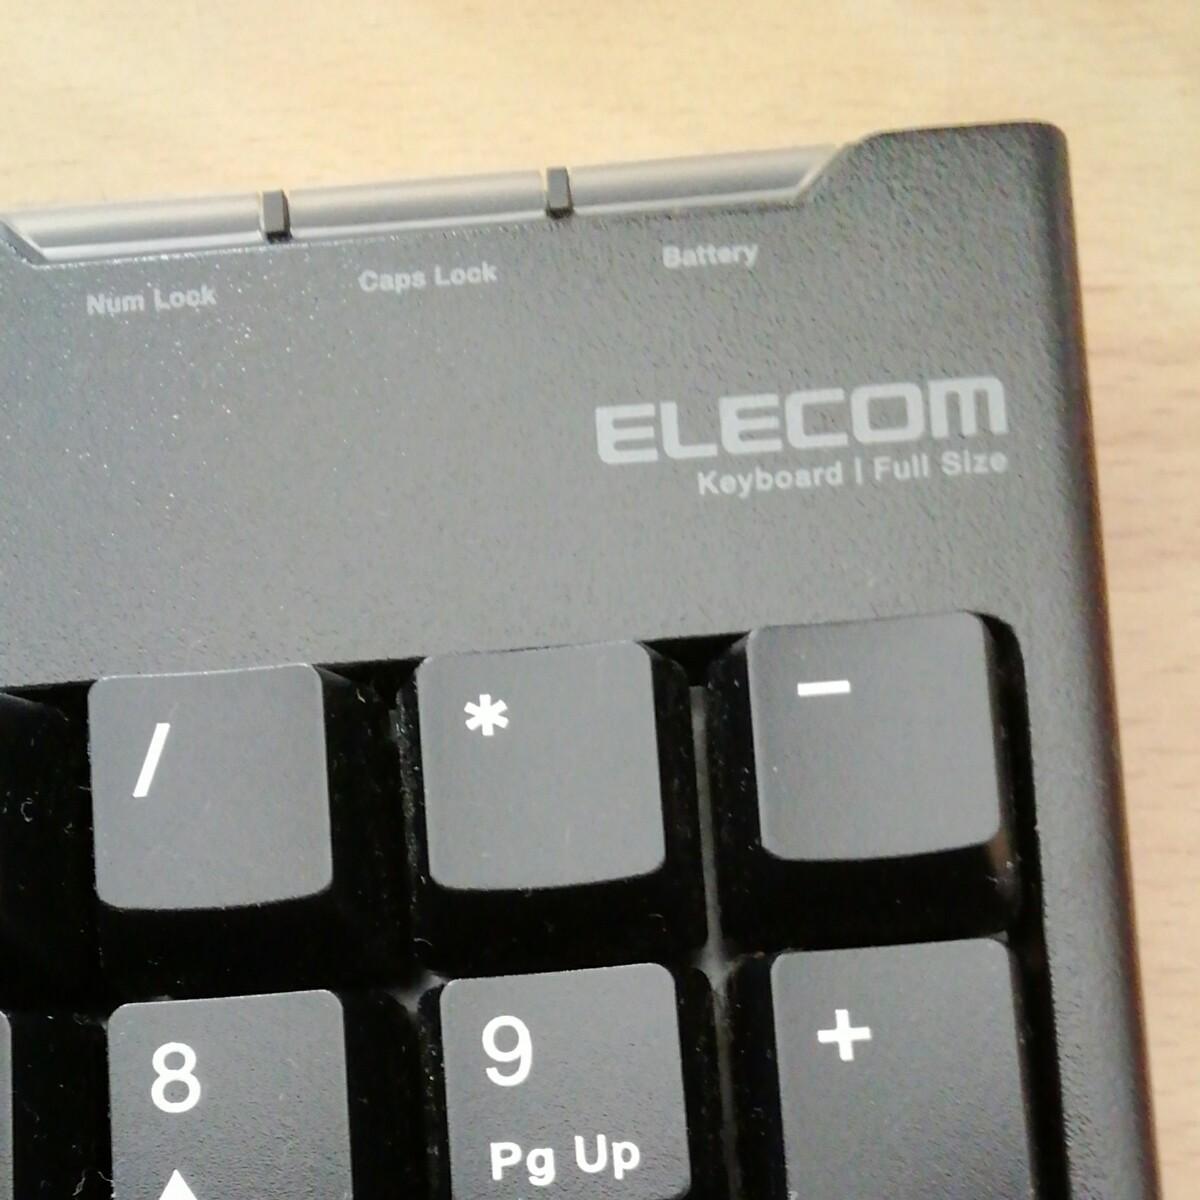 ELECOM TK-FDM063BK 2.4GHz ワイヤレスキーボード マウス無し